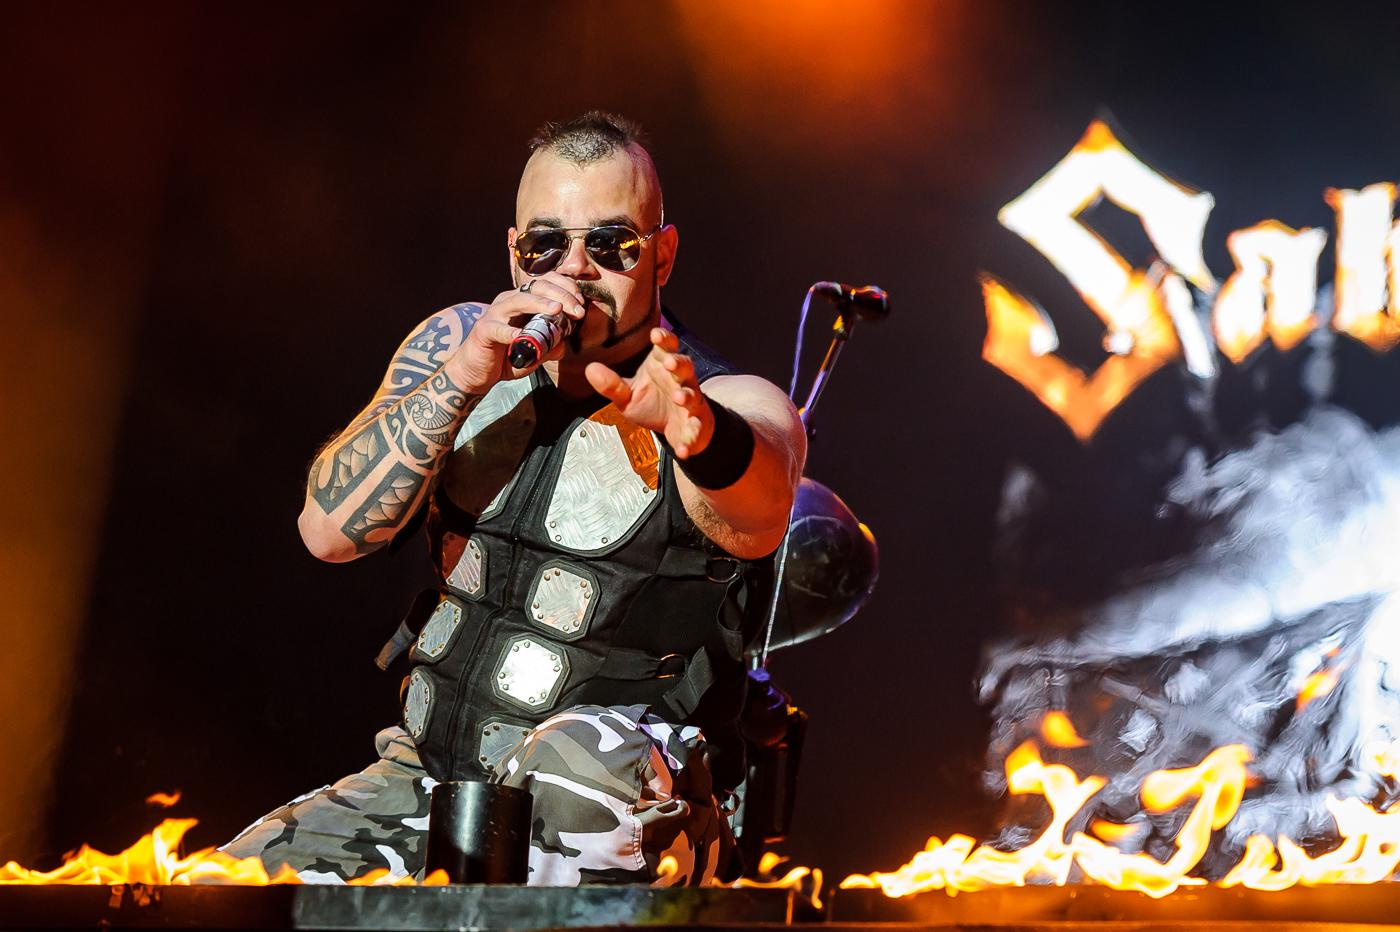 Sabaton @ Sweden Rock 2016